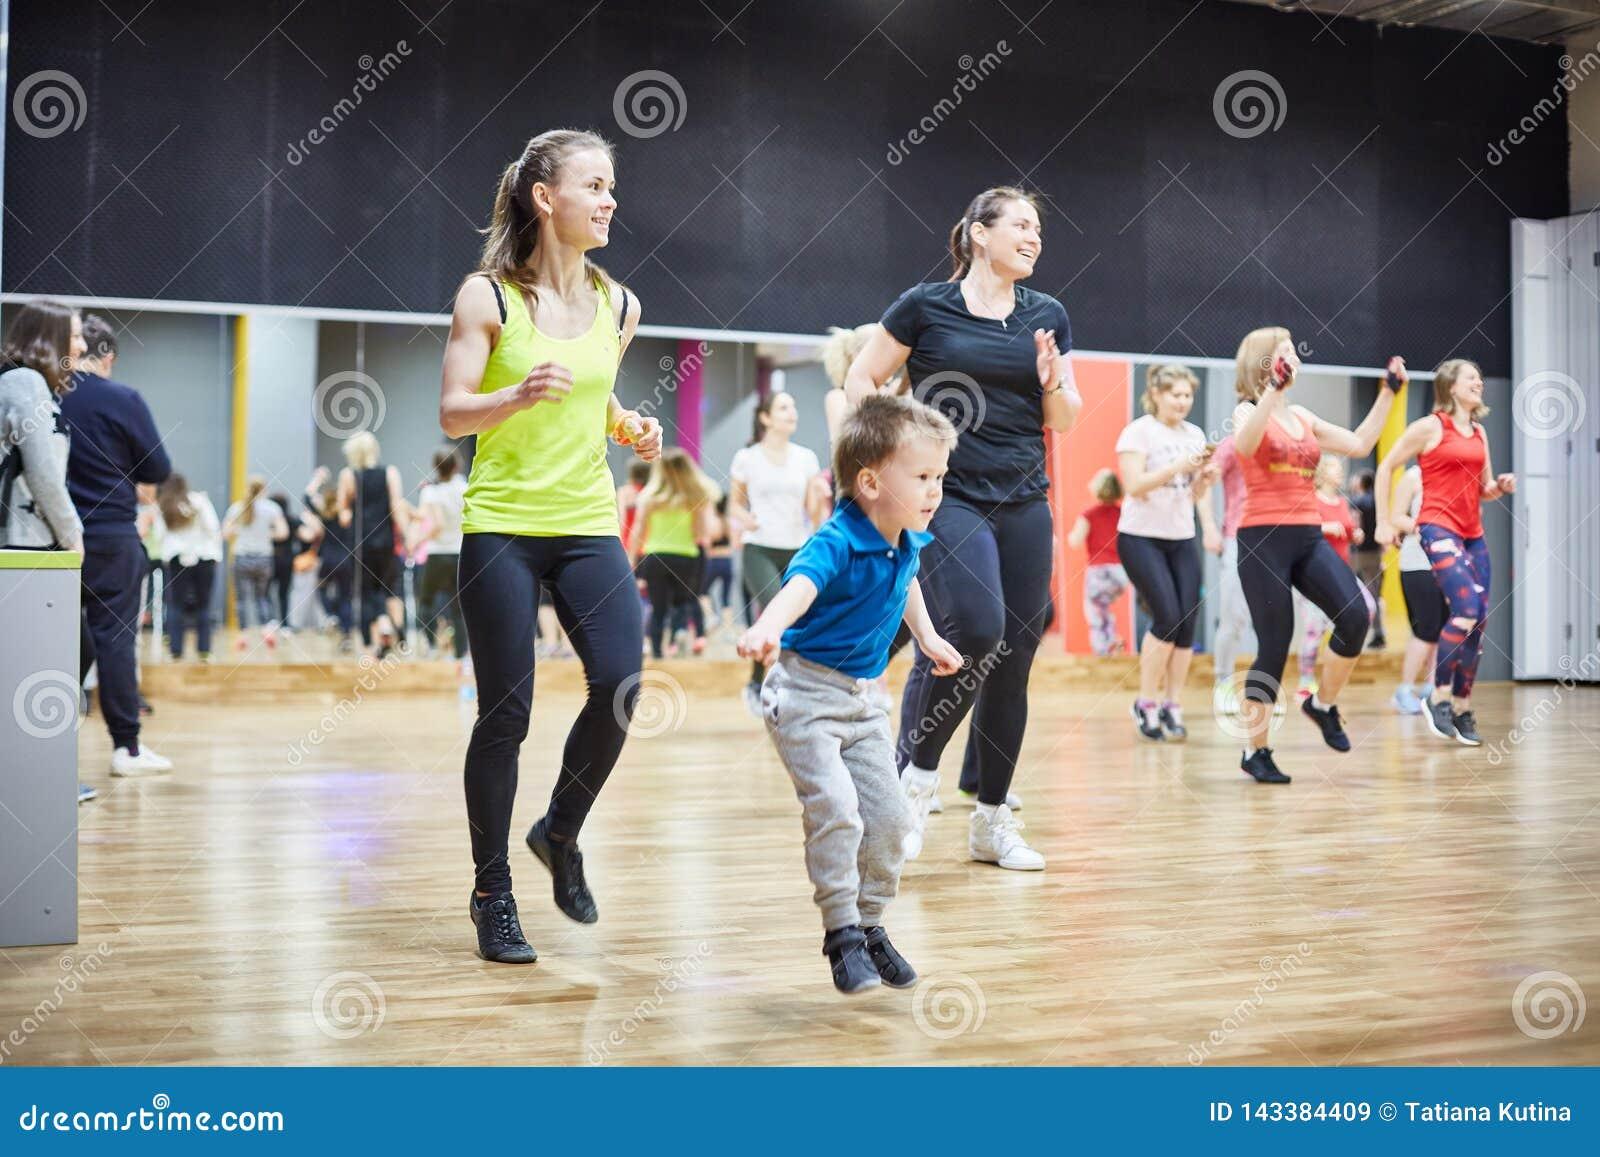 RUSLAND, MOSKOU - 03 JUNI, 2017 meisjes en jonge geitjes spelen sporten in de gymnastiek